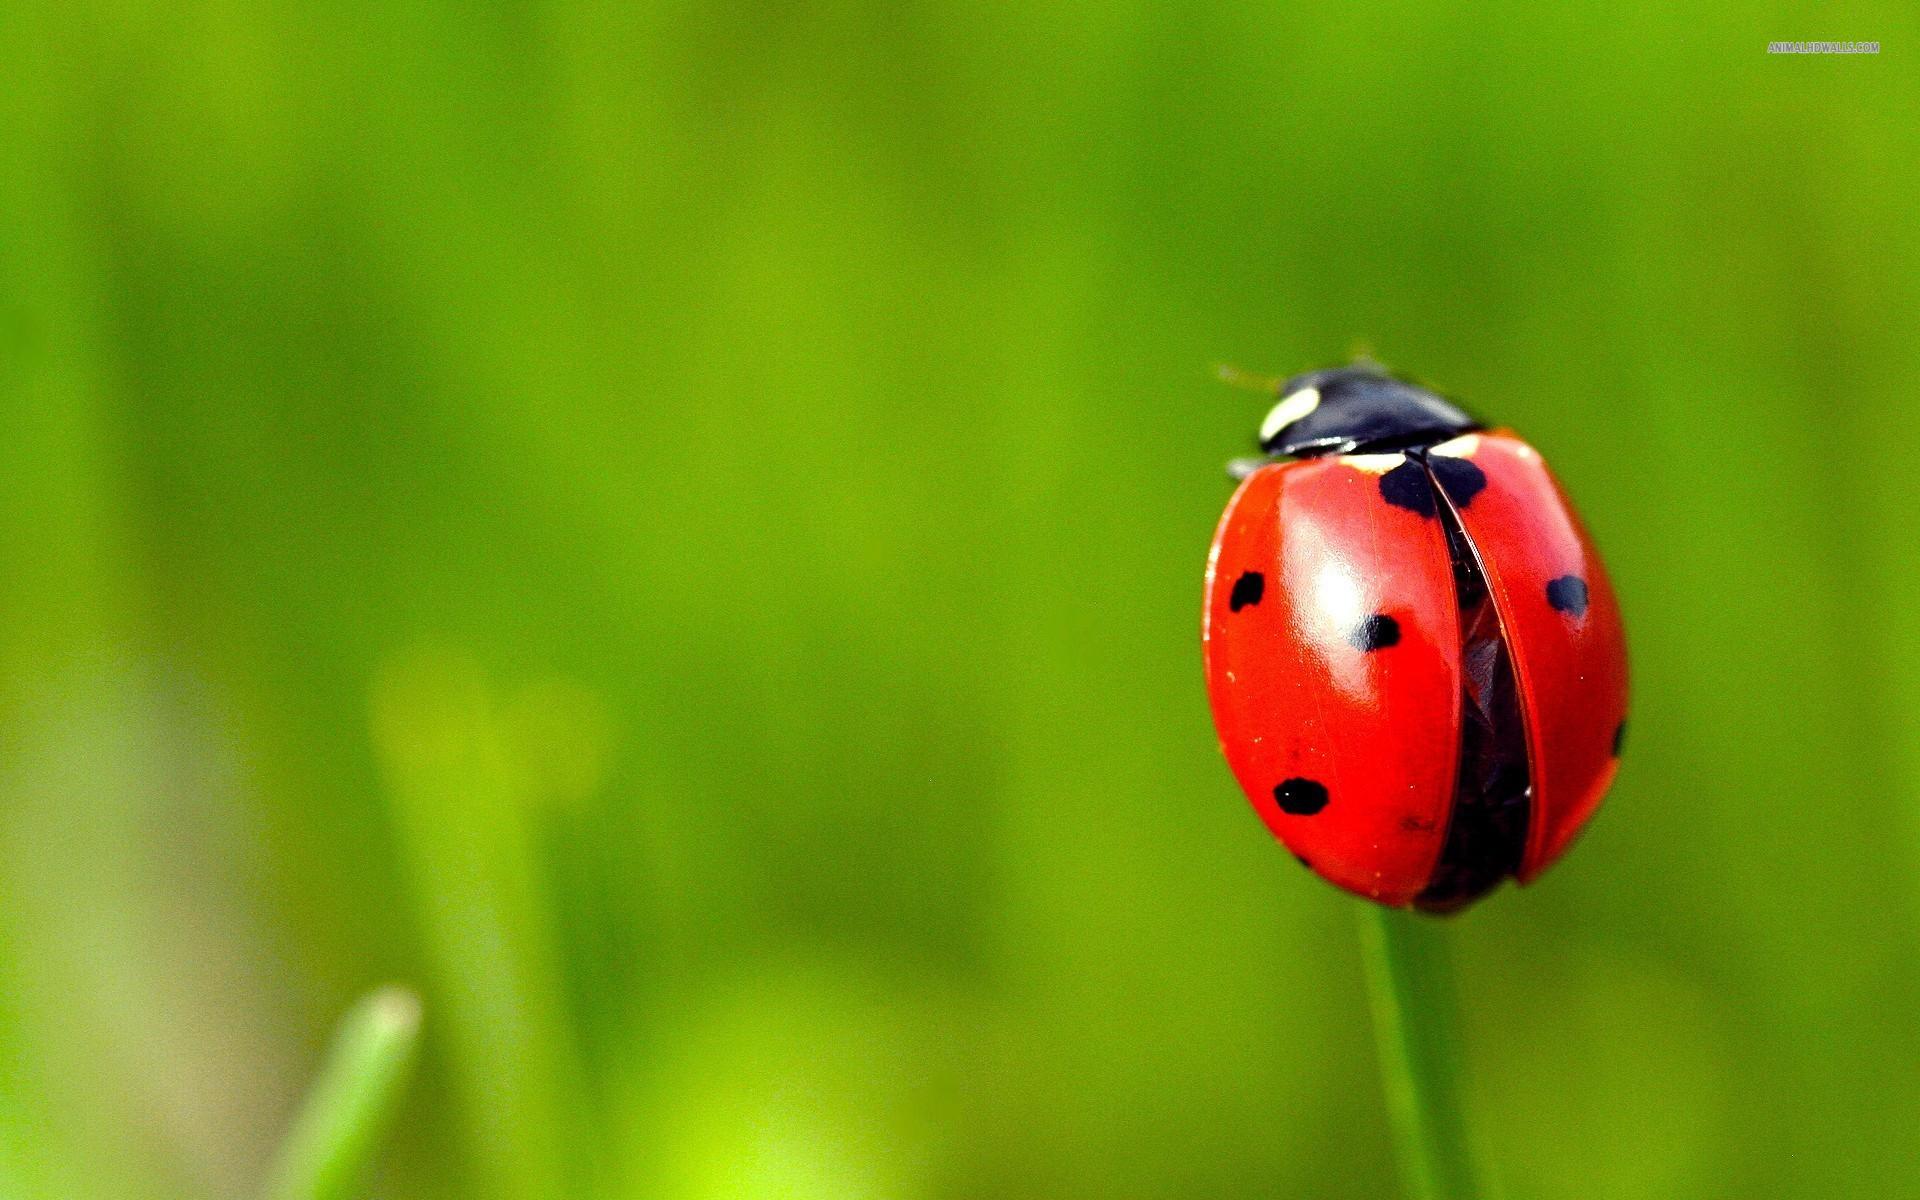 Ladybug Picture Wallpaper HD Desktop